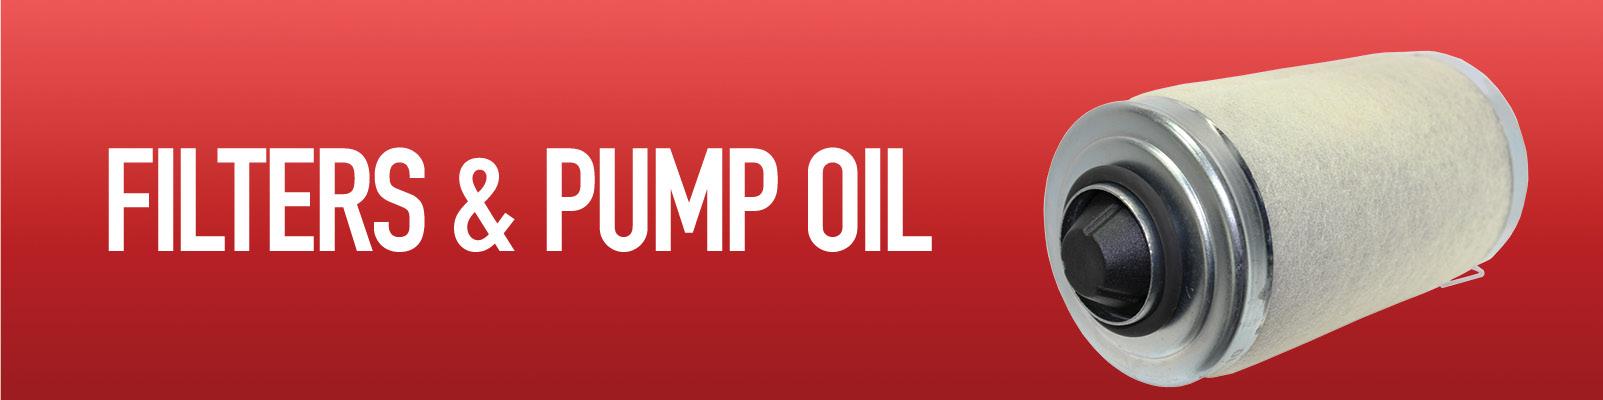 Filters / Pump Oil